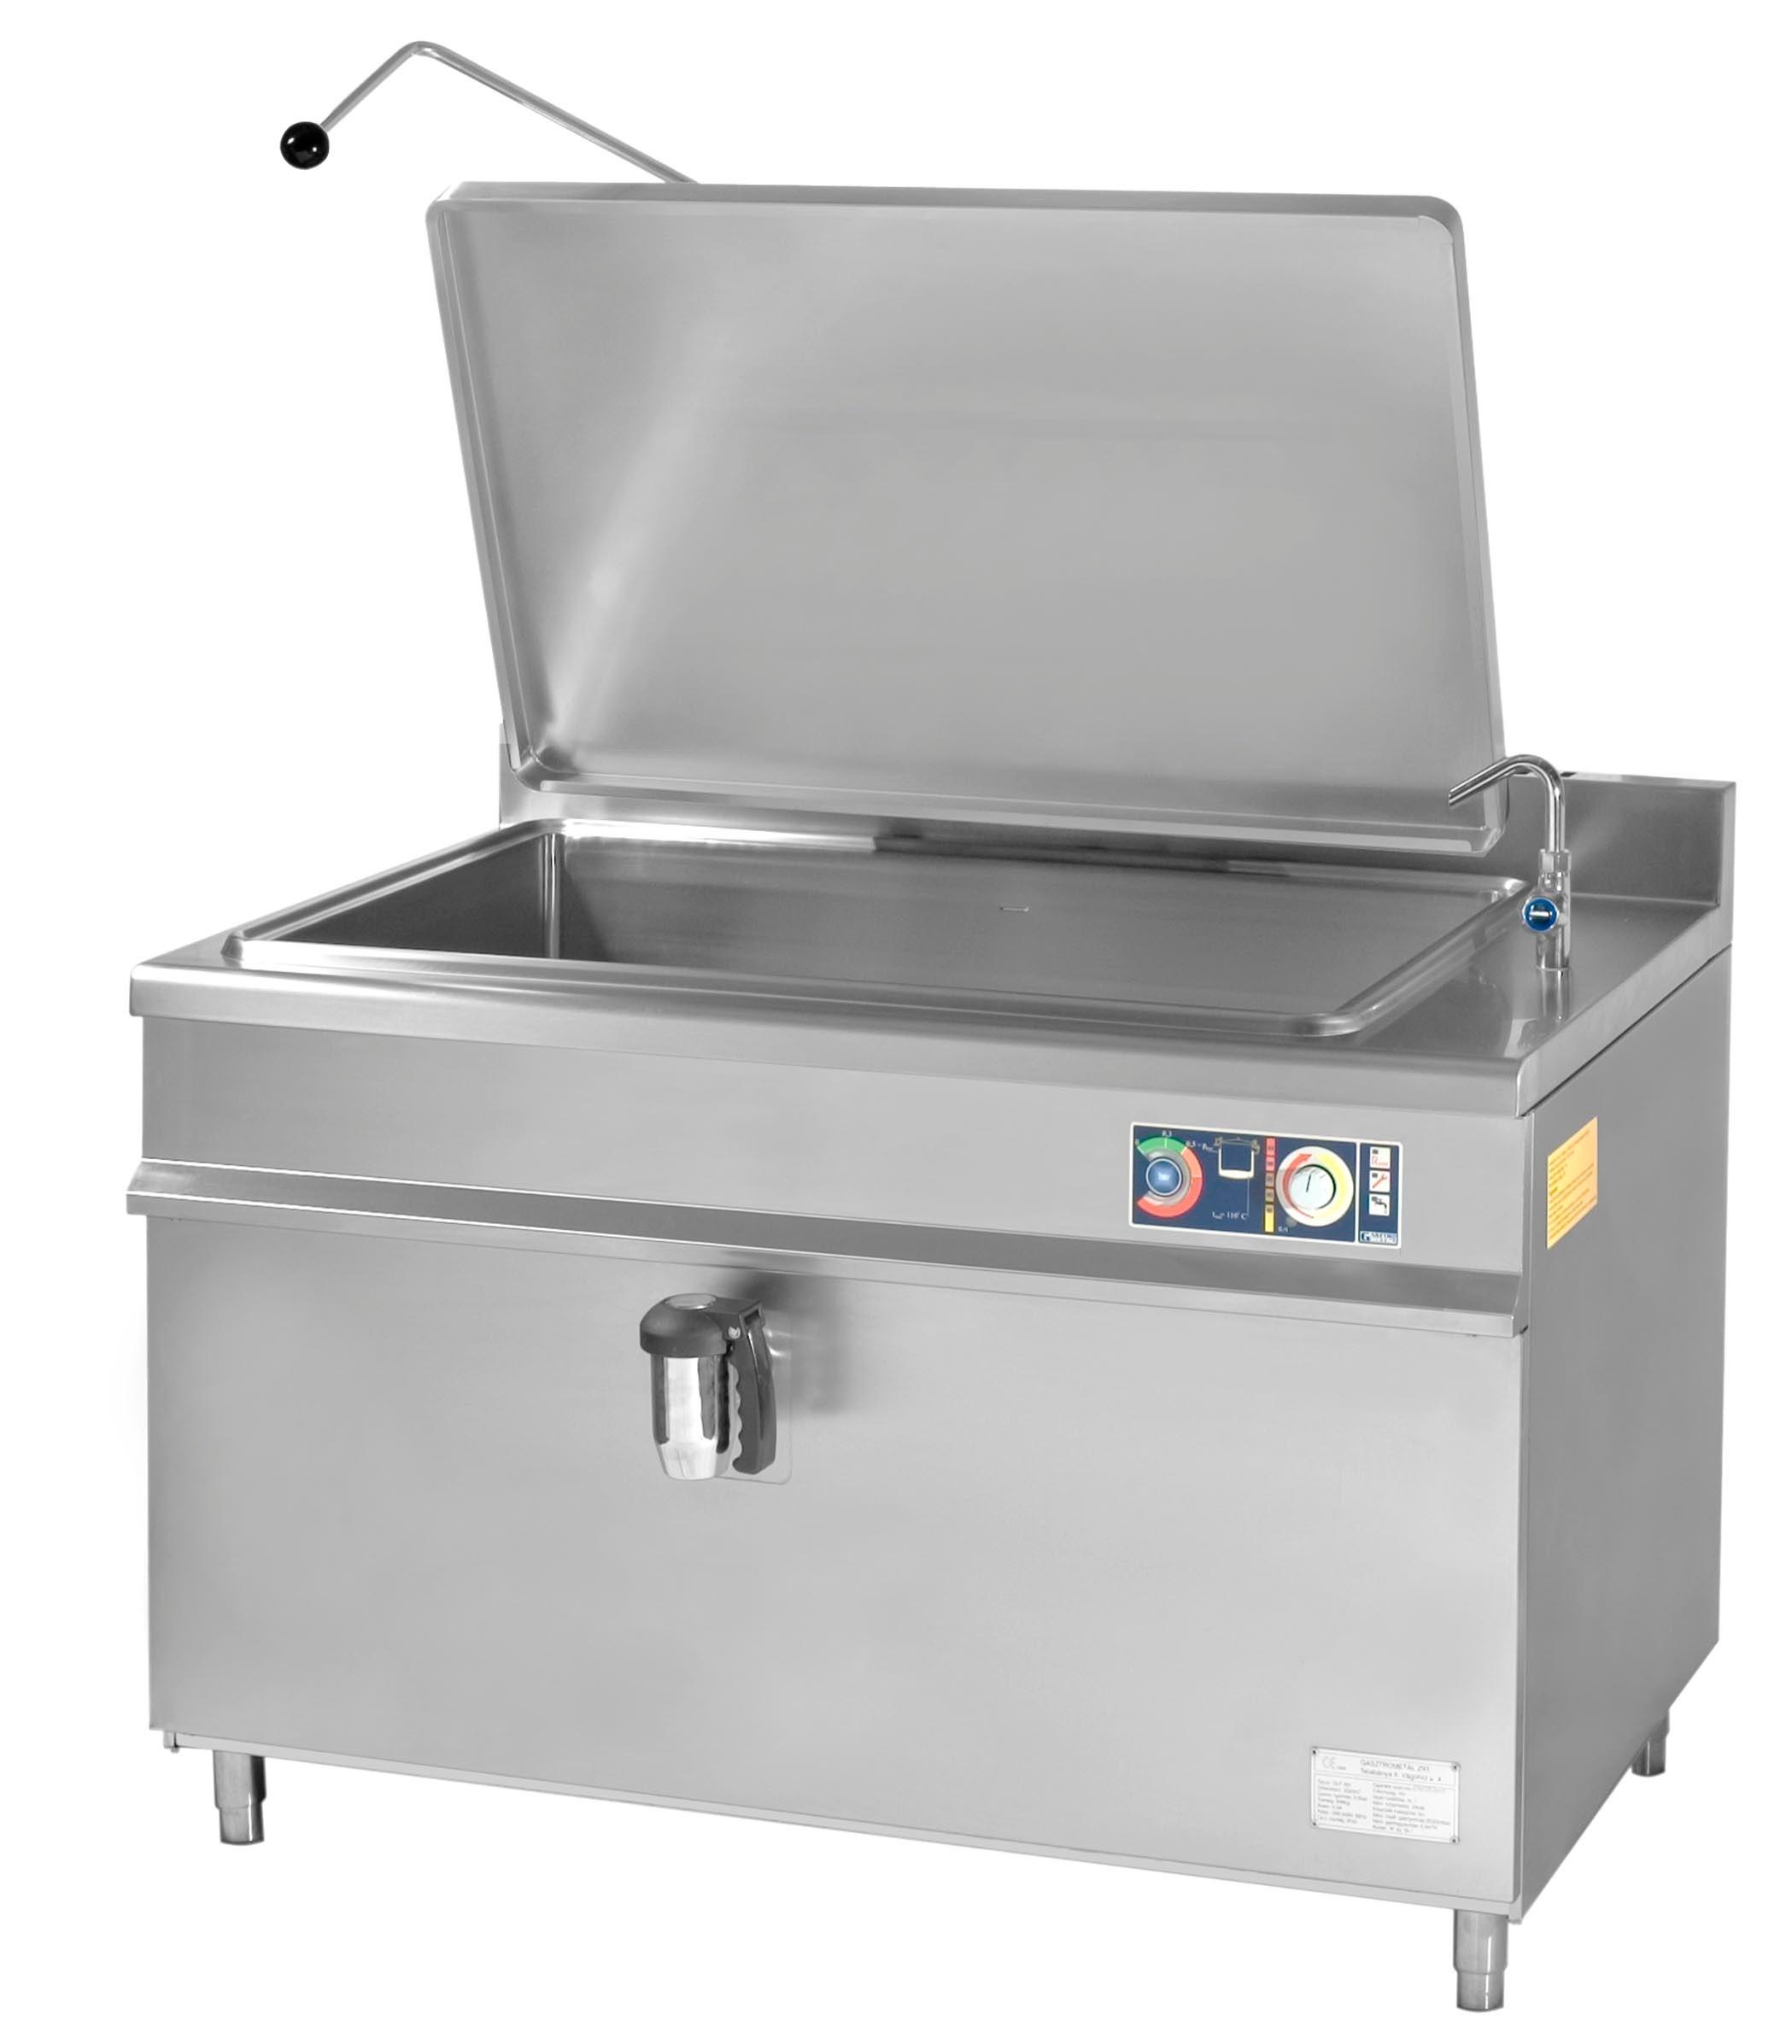 Gázüzemű főzőüst 300 literes GM-GLF-302